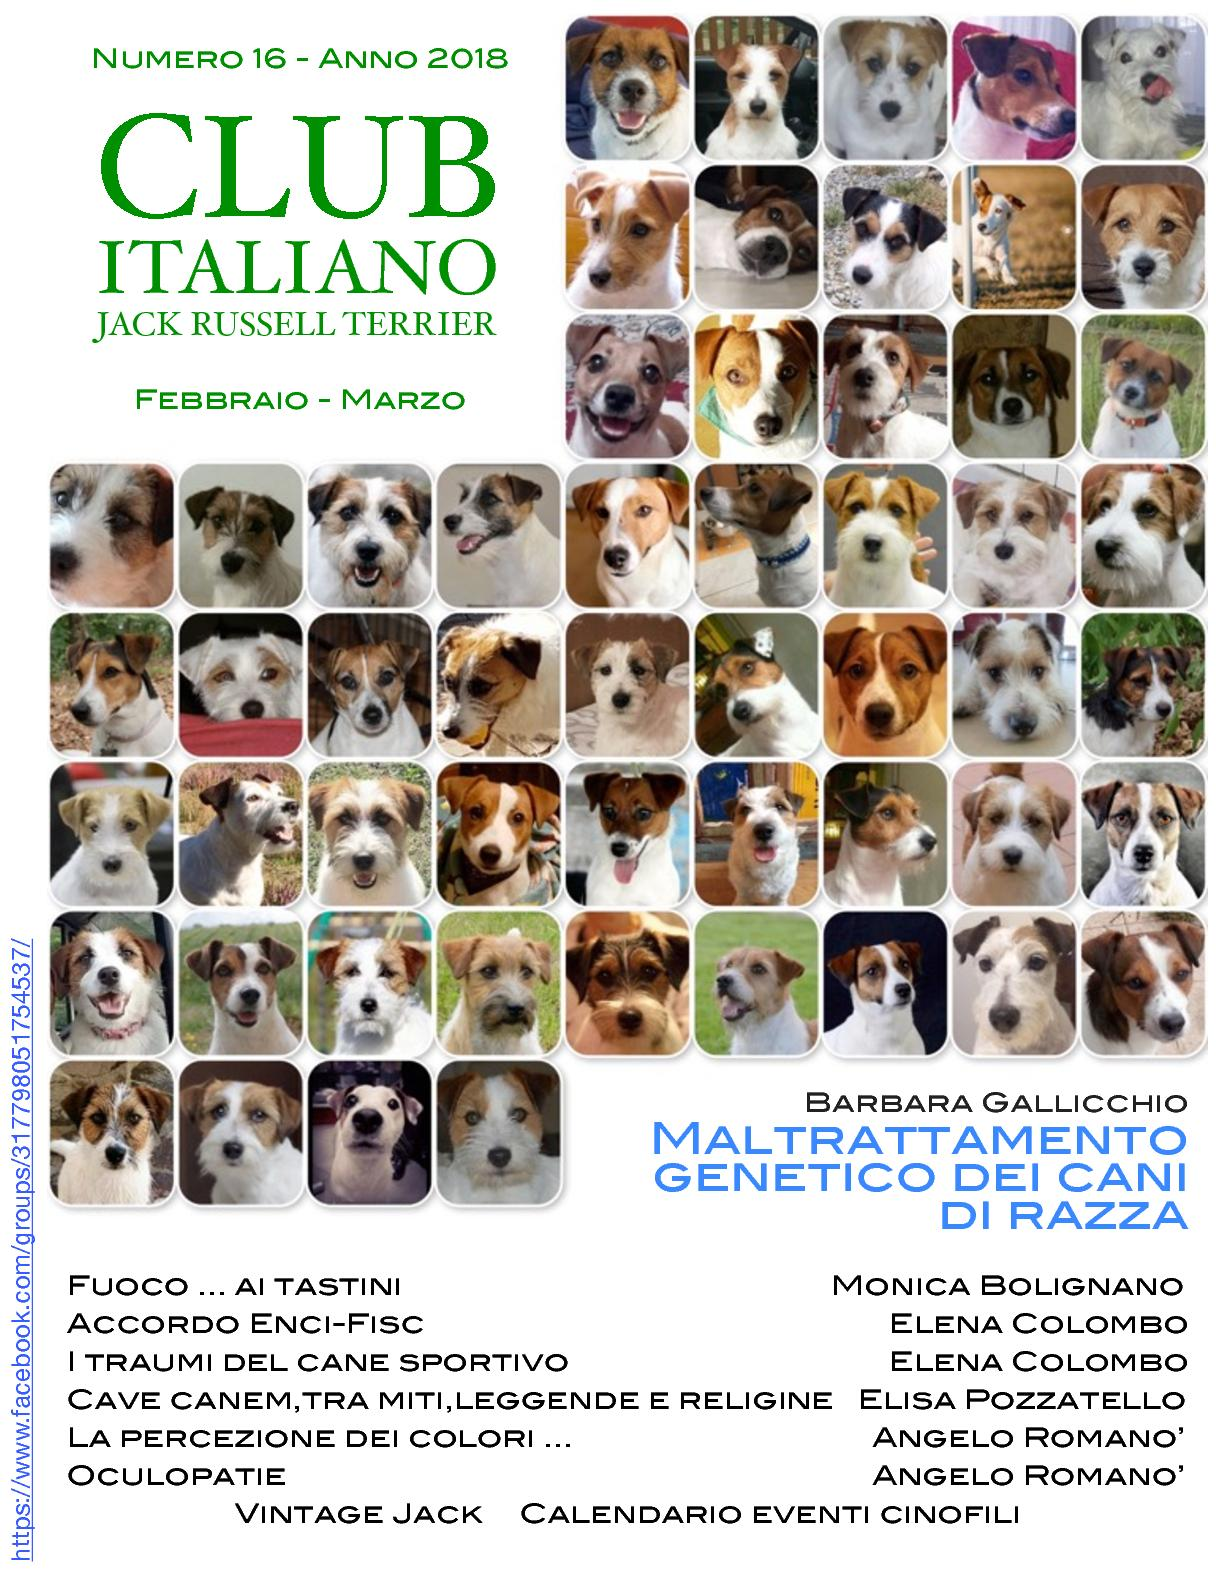 Expocani Calendario.Calameo Club Italiano Jack Russell Terrier N 16 2018